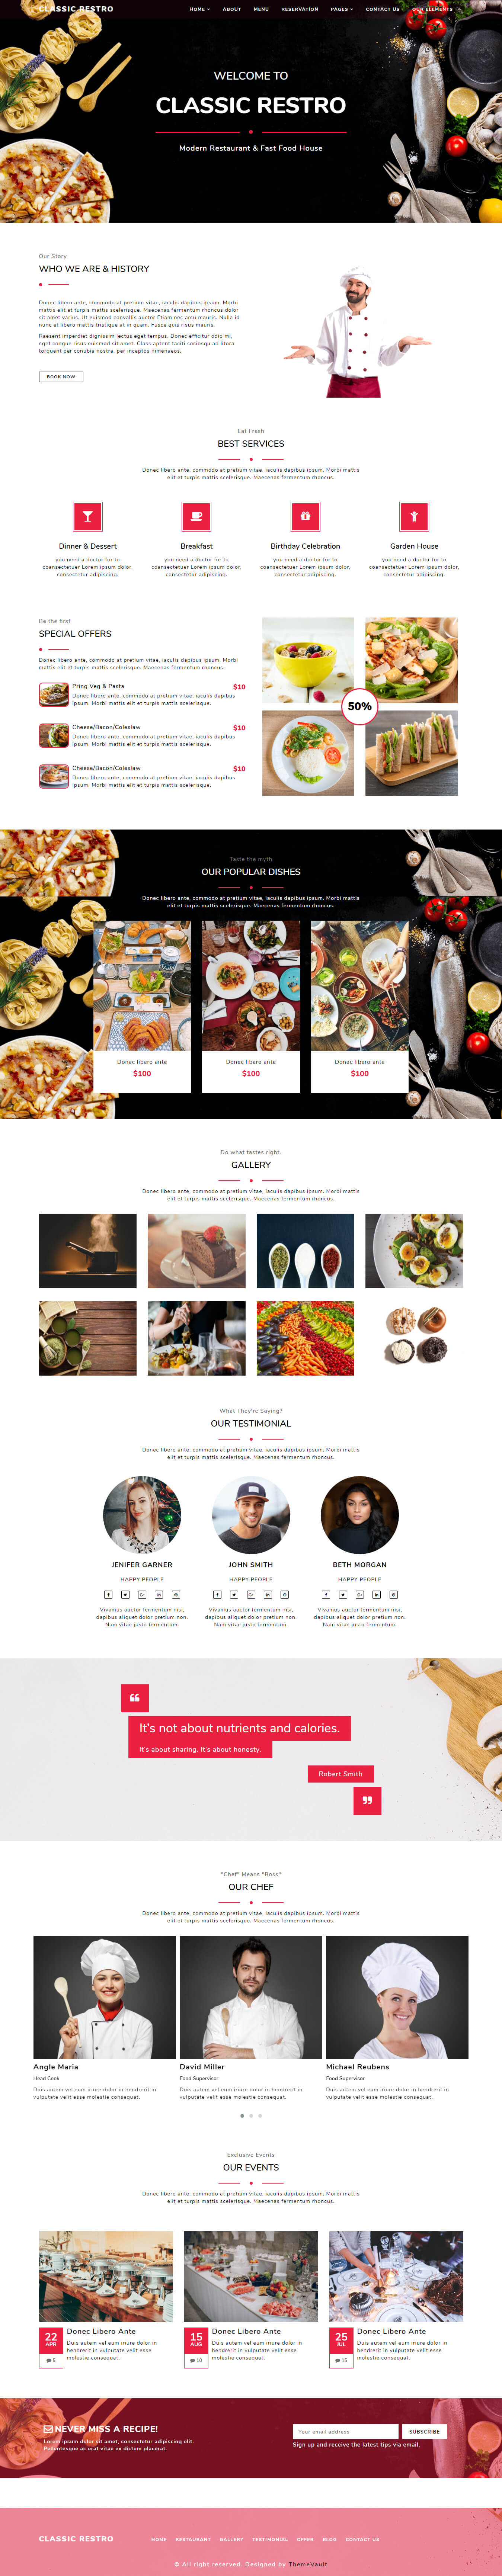 ClassicRestro – HTML5 Restaurant Menu Layout Template Free